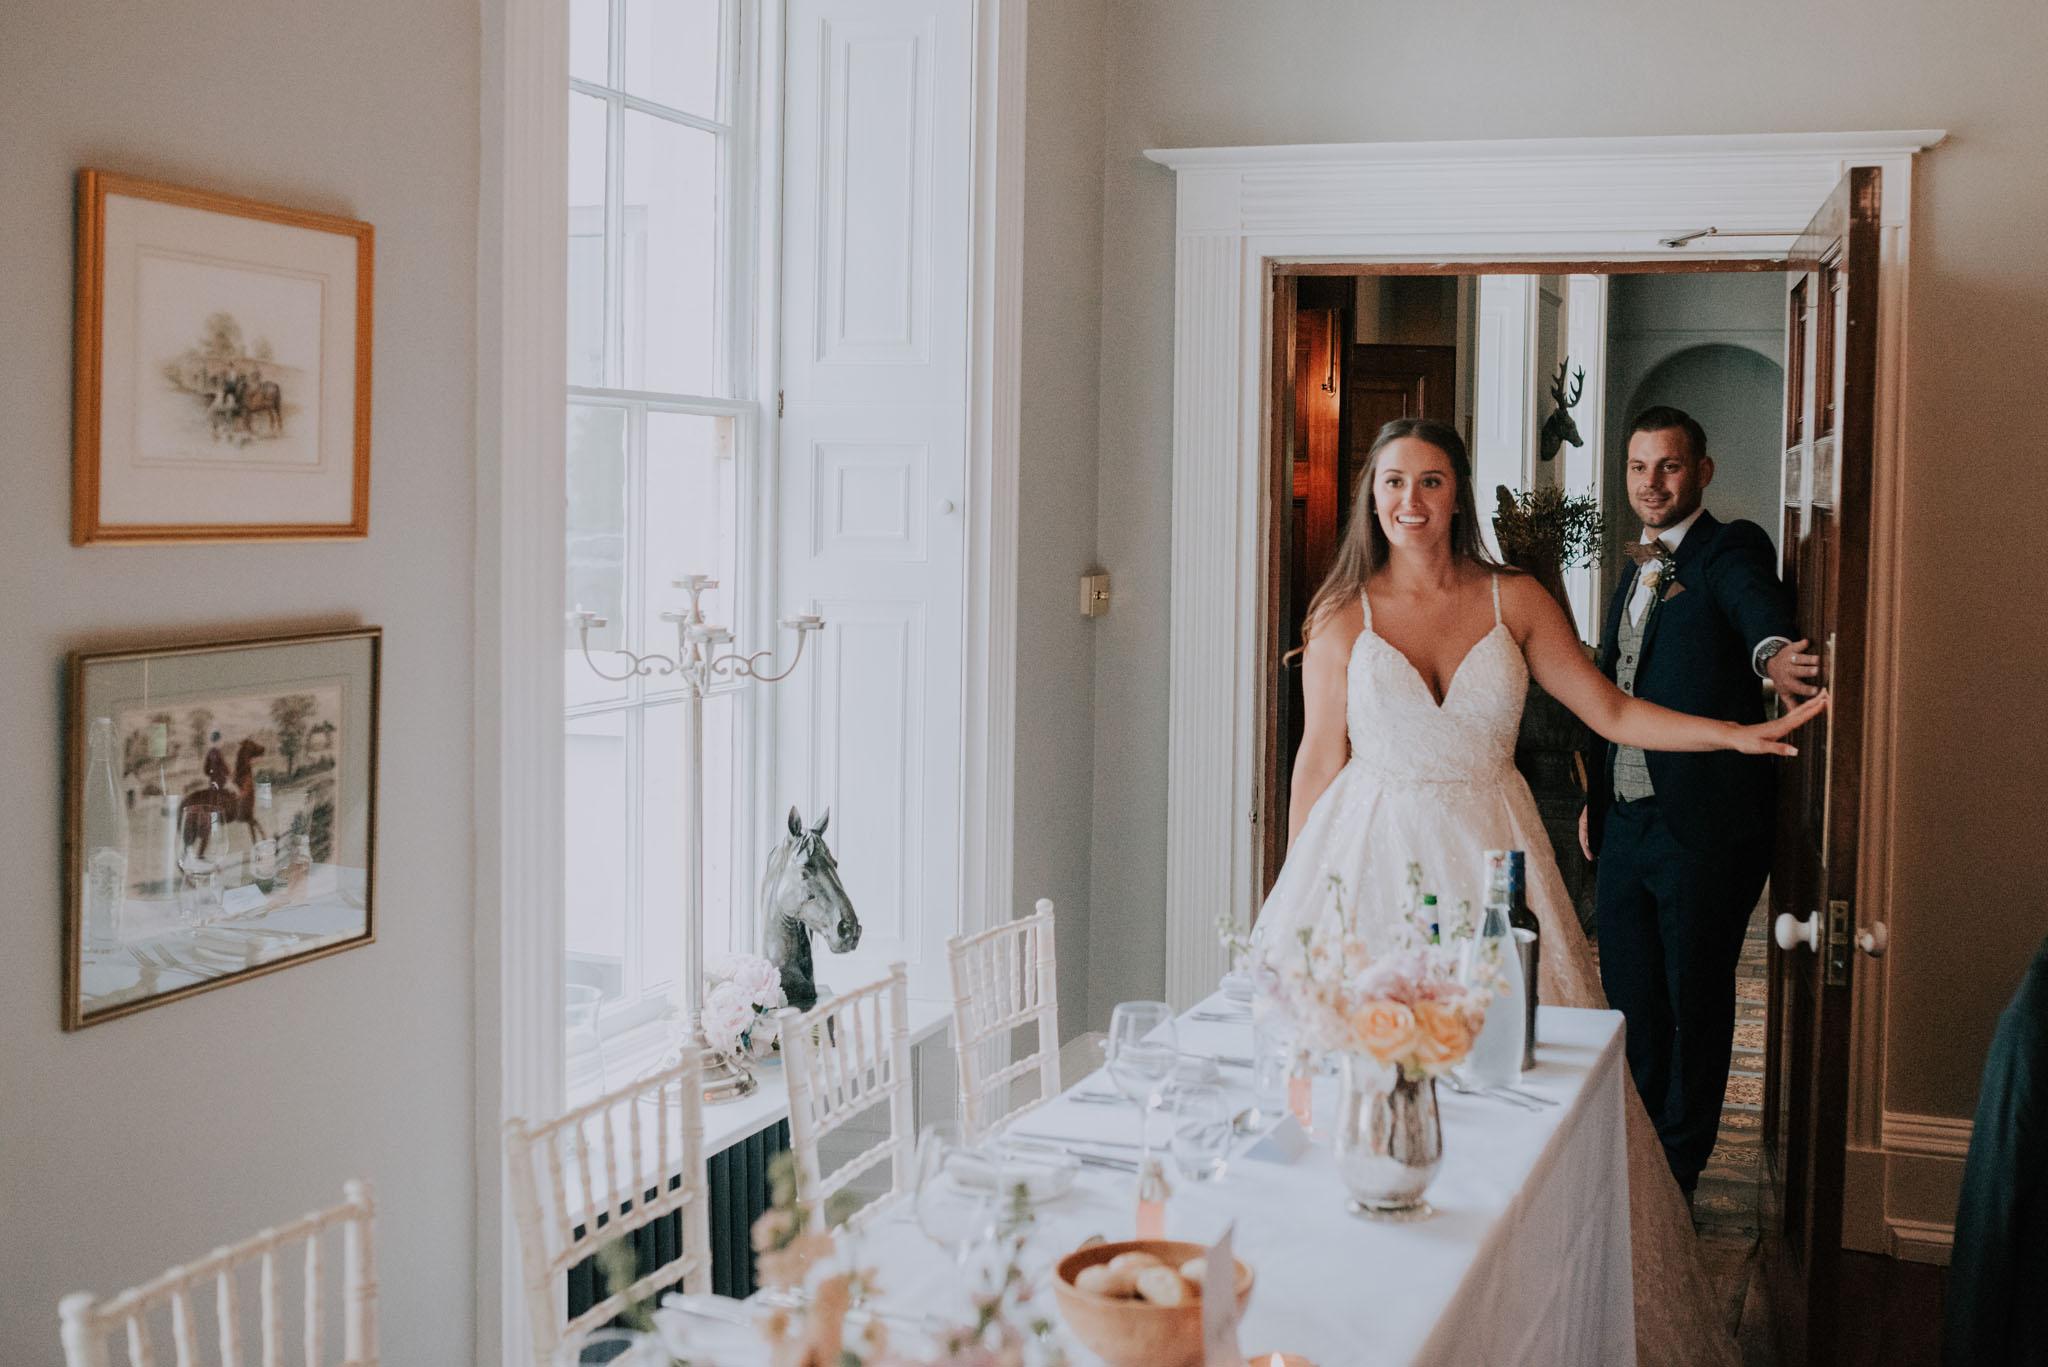 wedding-photographer-glewstone-court-hereford-scott-stockwell-photography377.jpg